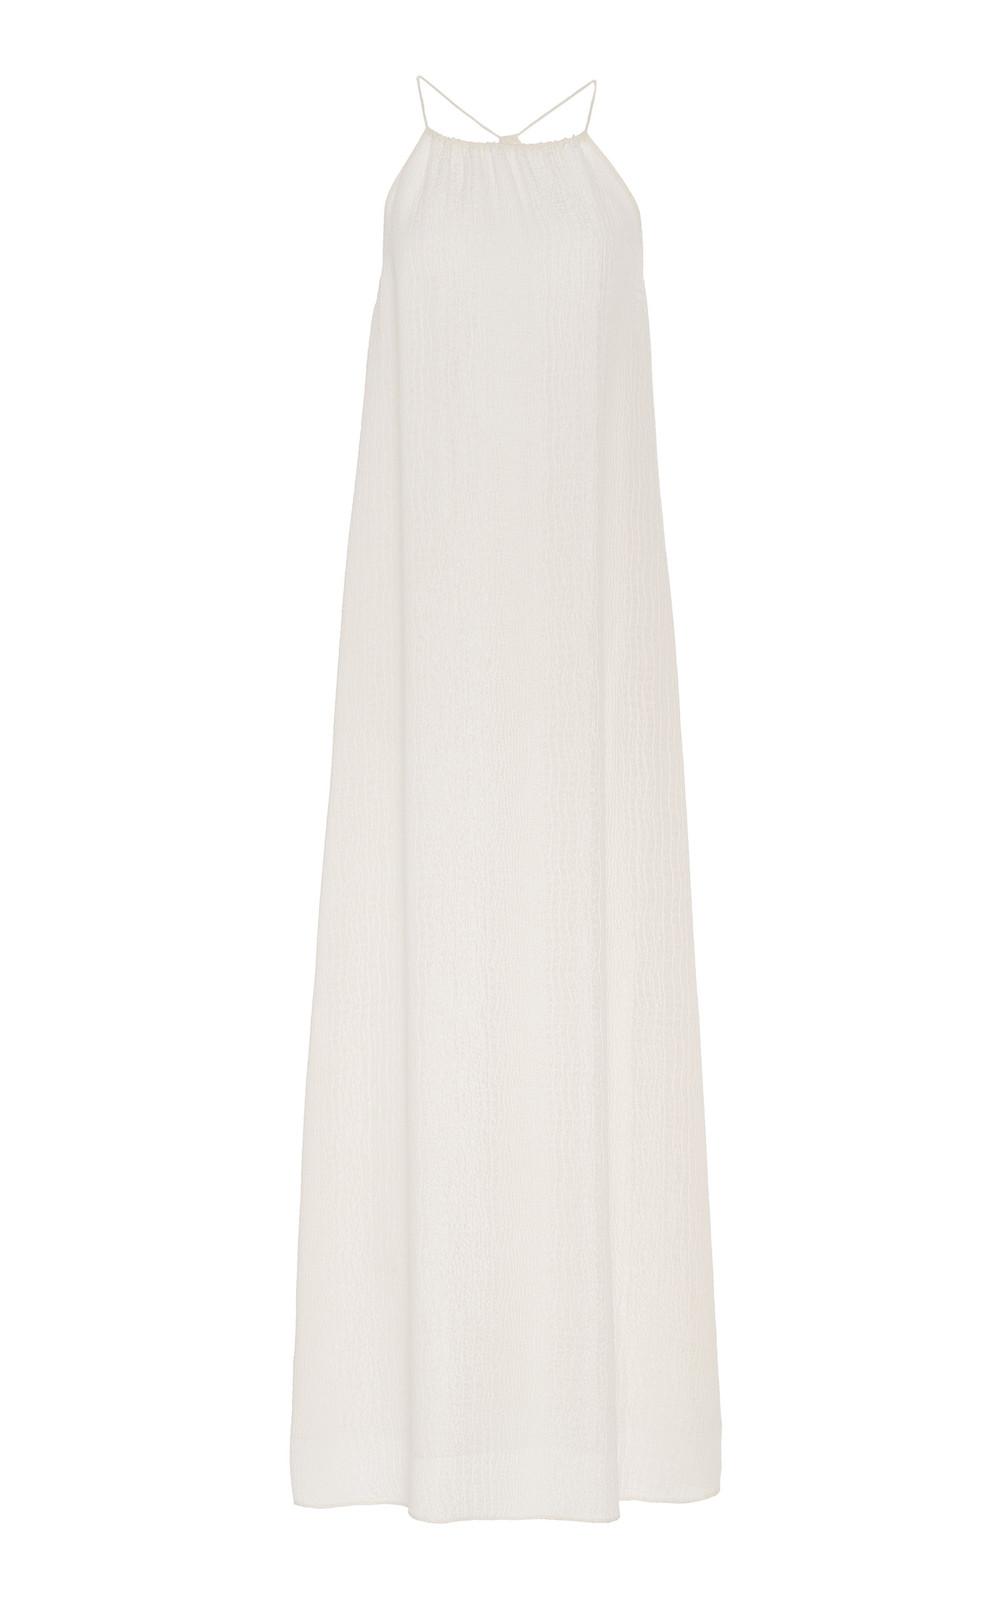 Marie France Van Damme Croco Racer Back Long Dress in white